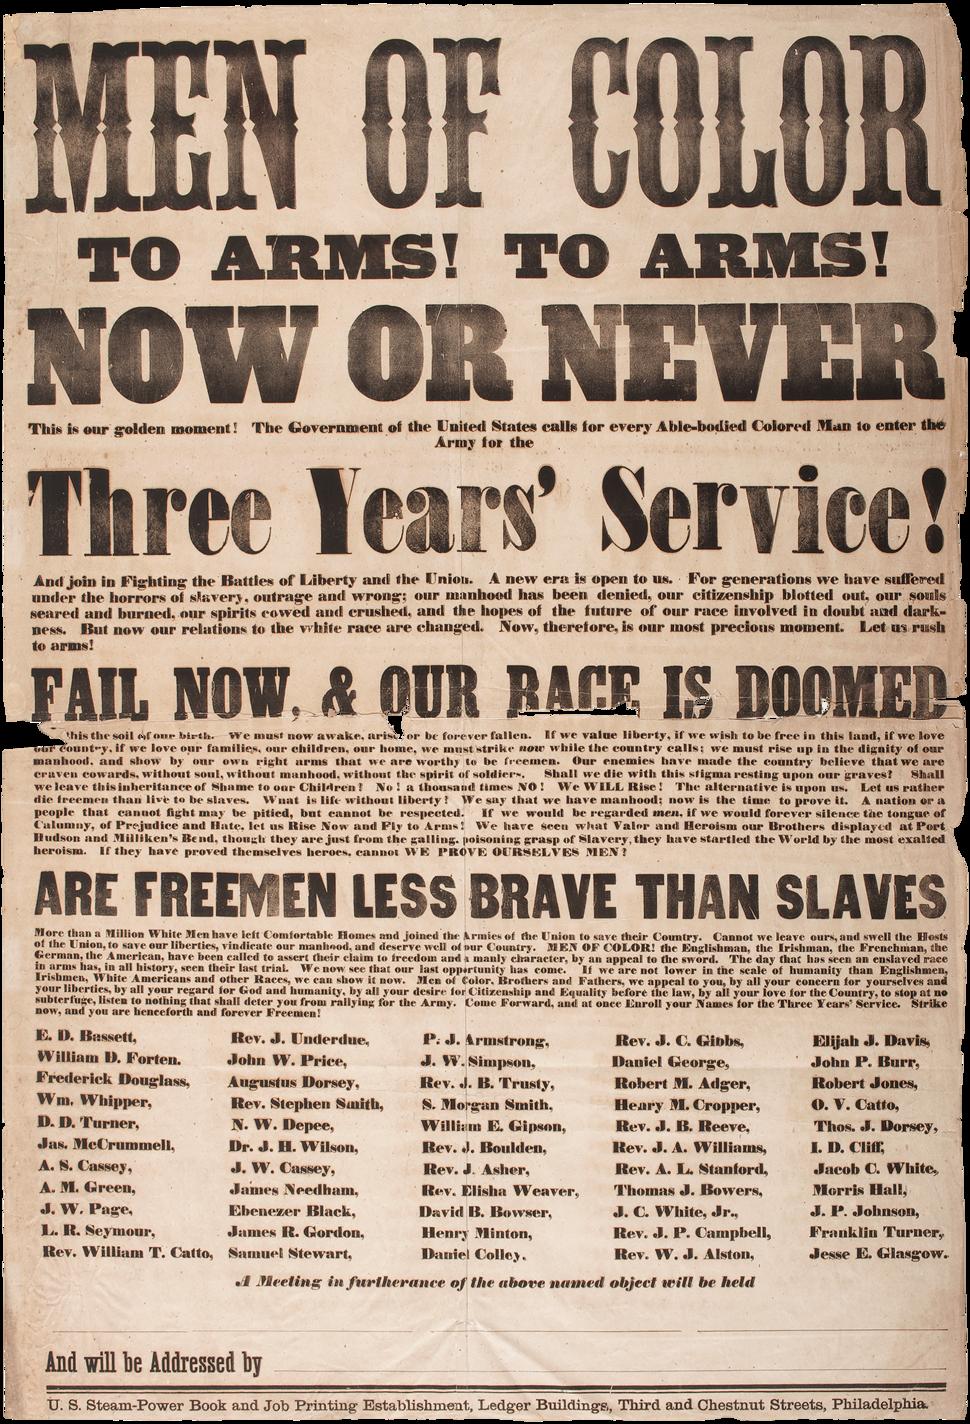 Men of Color Civil War Recruitment Broadside 1863